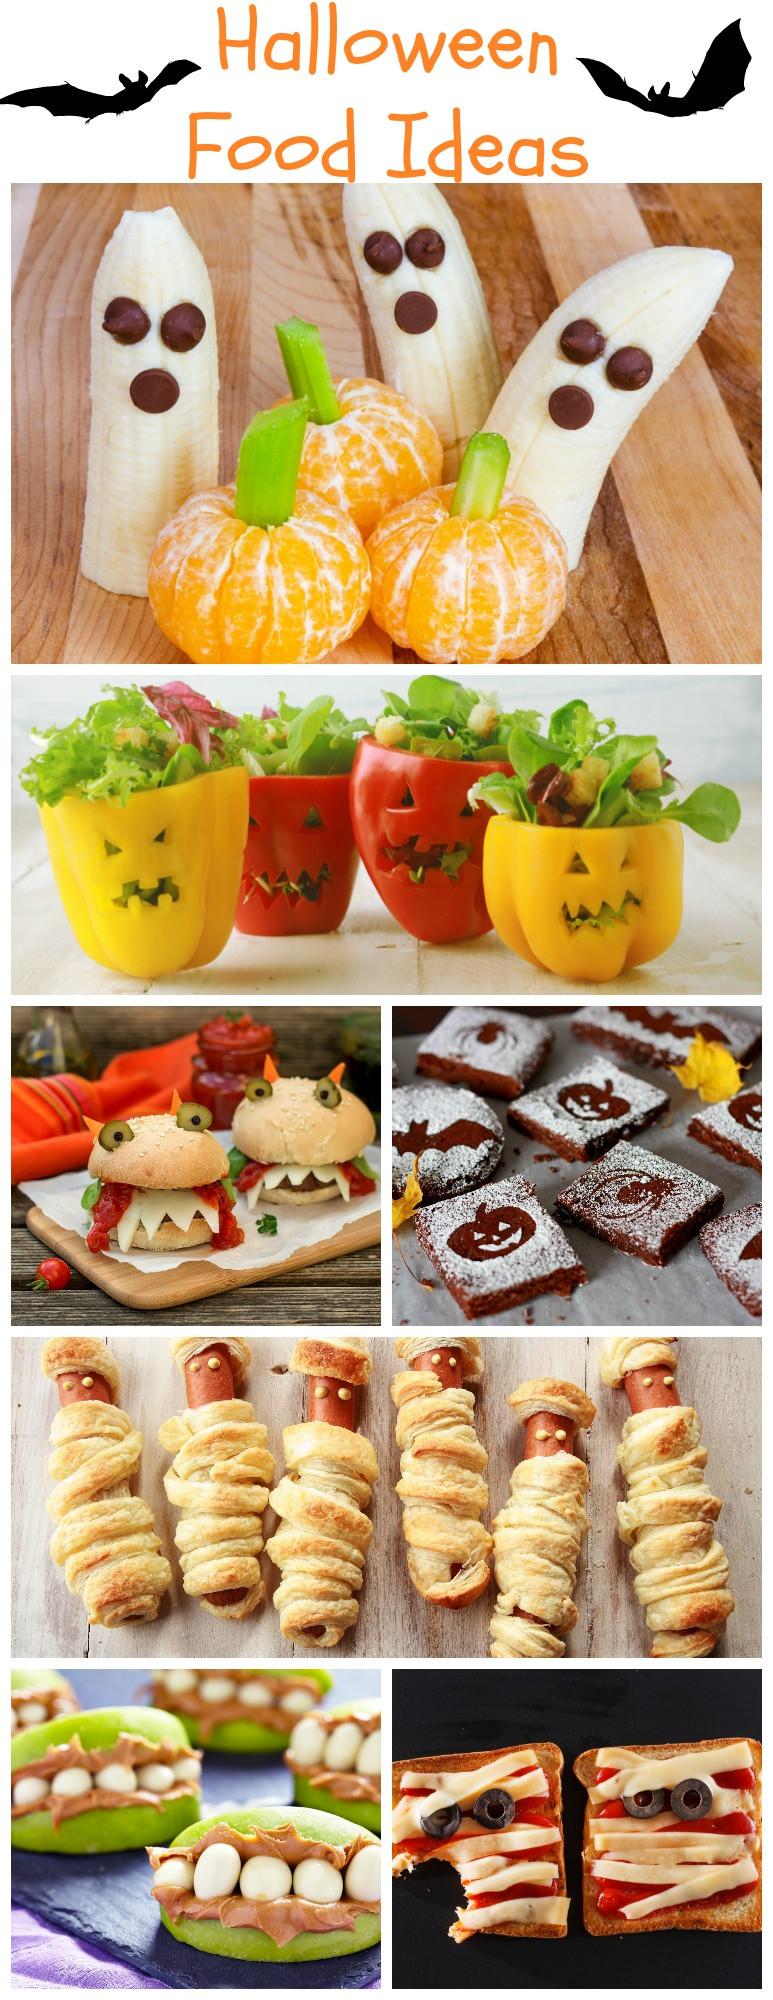 Creative Halloween Food Ideas  Halloween Food Ideas Your Kids Will Love Rustic Baby Chic